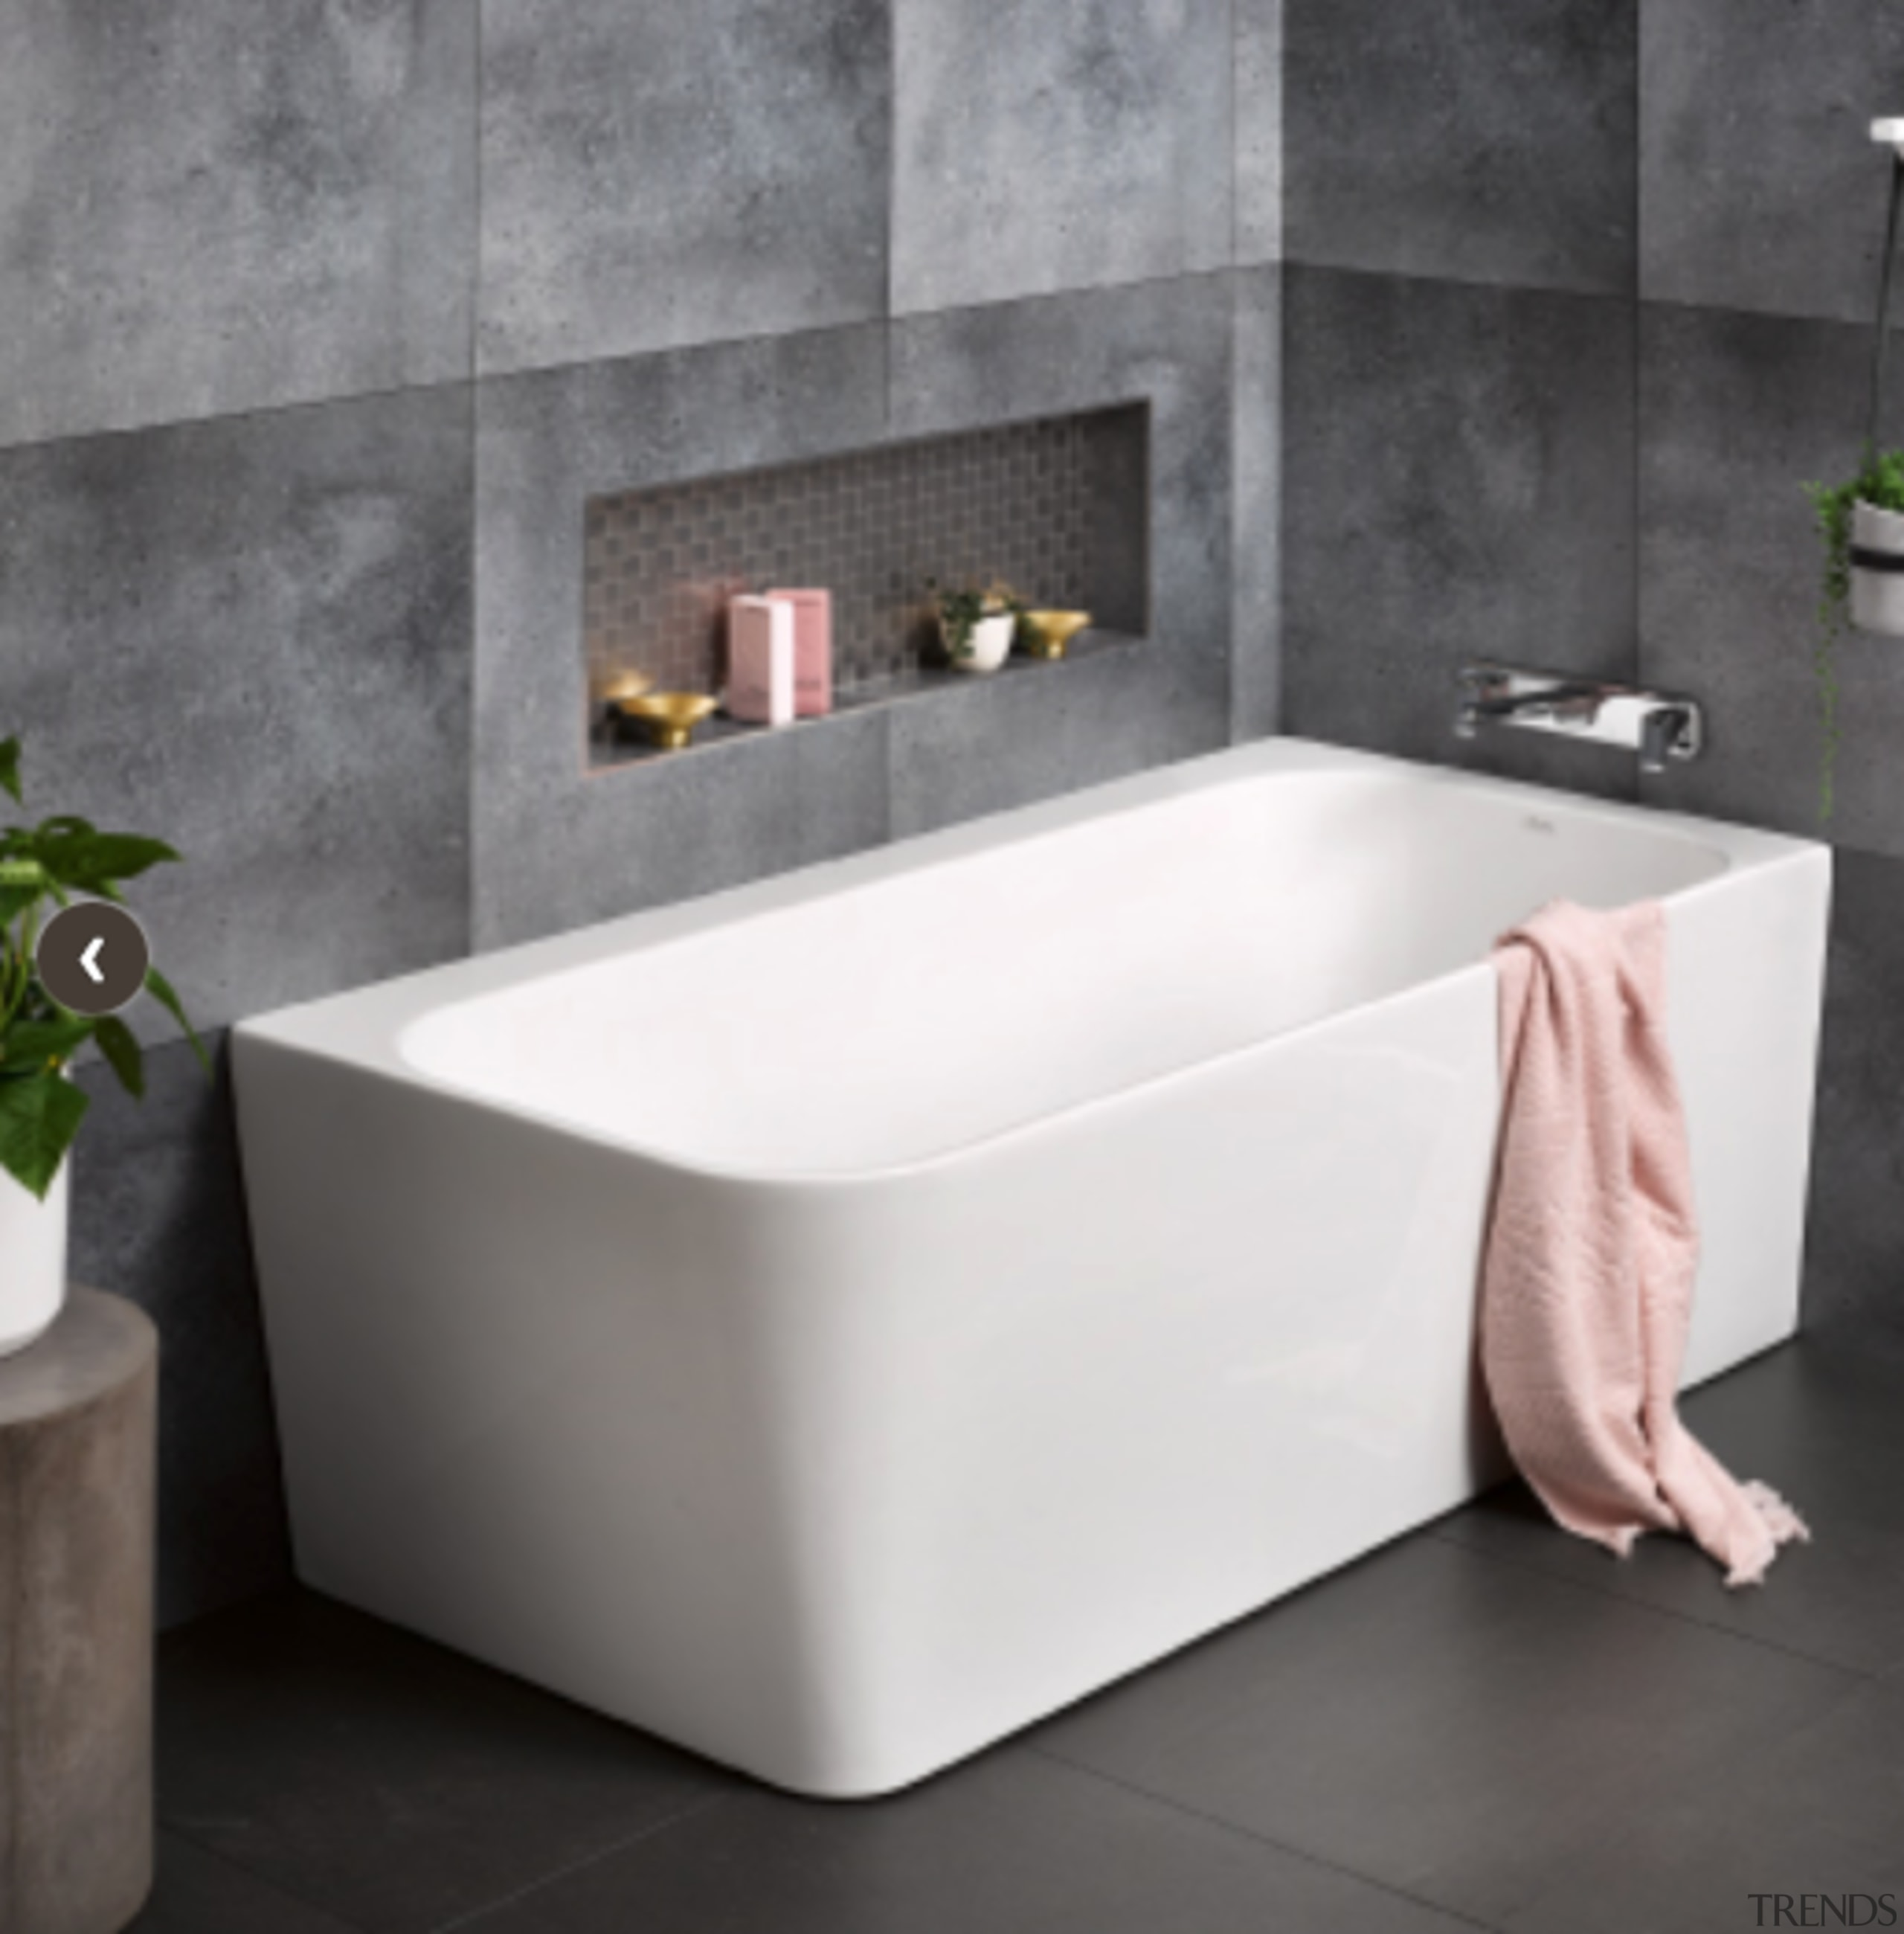 Contro Corner Bath - Contro Corner Bath - angle, bathroom, bathroom sink, bathtub, ceramic, floor, plumbing fixture, tap, gray